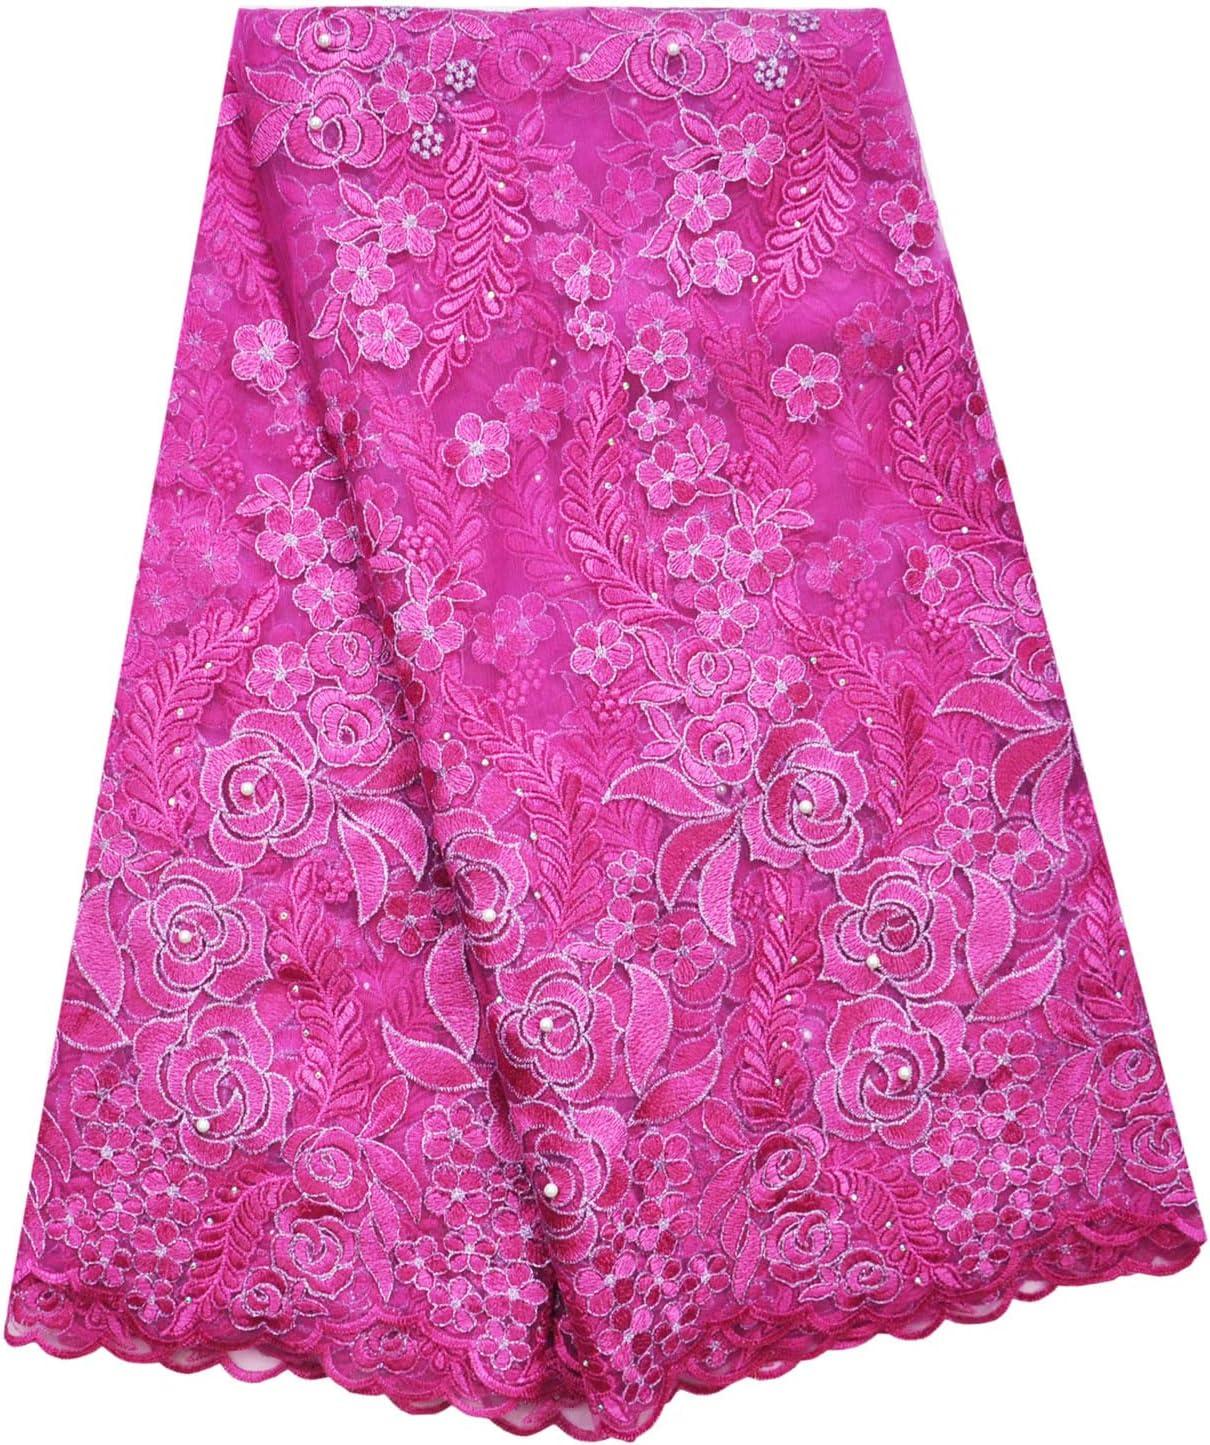 SanVera17 即出荷 African Lace Net Fabrics Fabric French Rope SALE開催中 E Nigerian